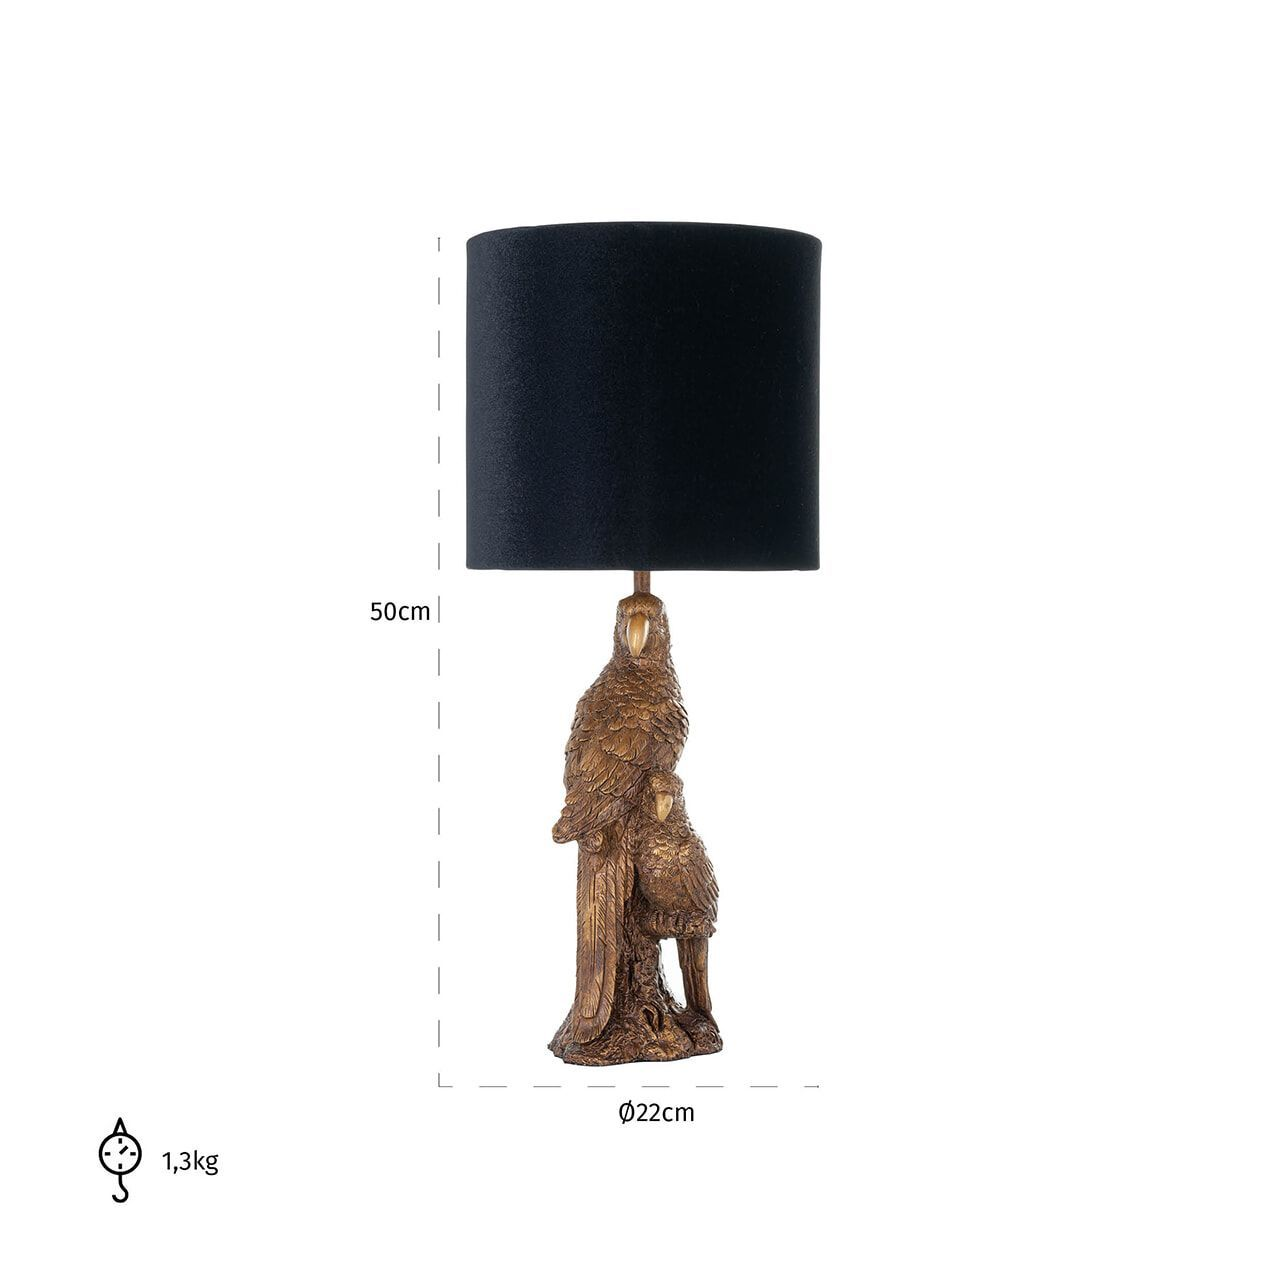 Richmond Tafellamp 'Andor', 50cm, kleur Zwart/Goud